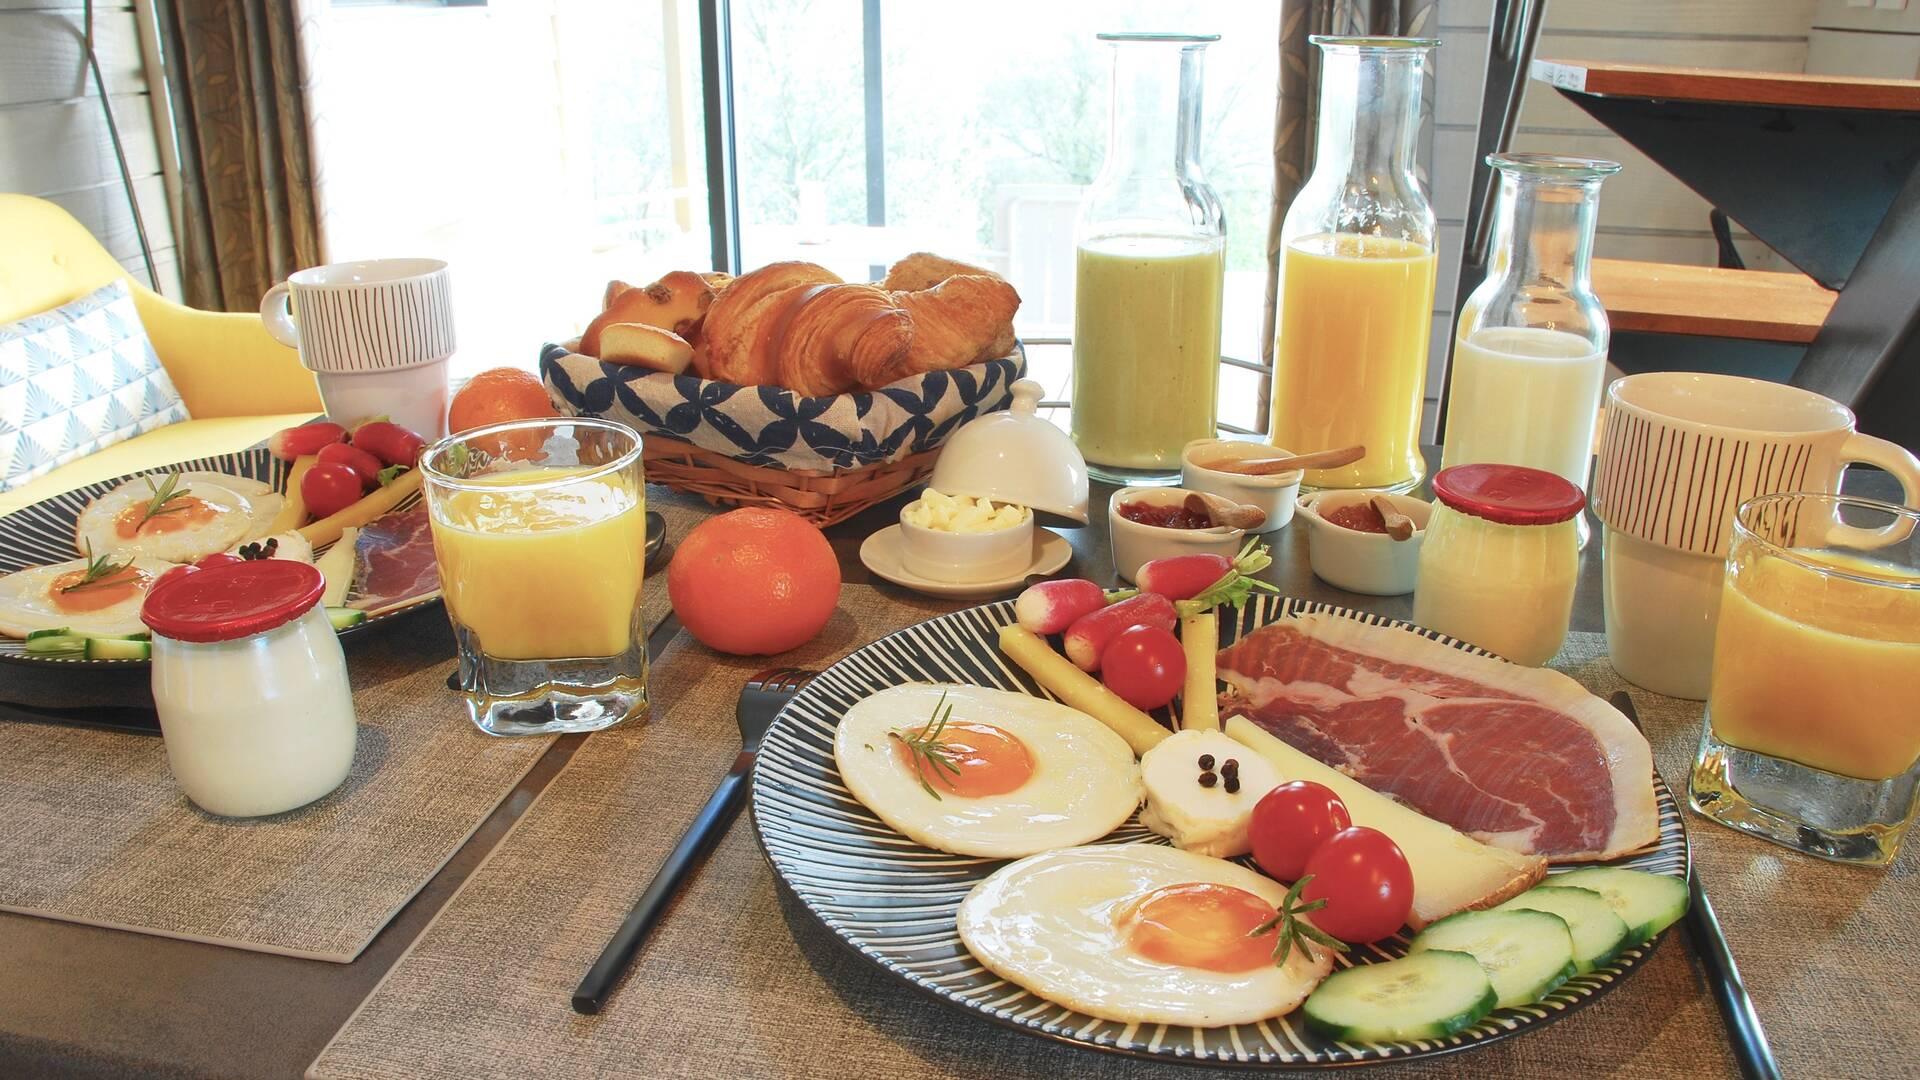 Breakfast, B&B Saga, Savignac-Mona, Lombez, Samatan, Savès, Gers, Gascogne, France